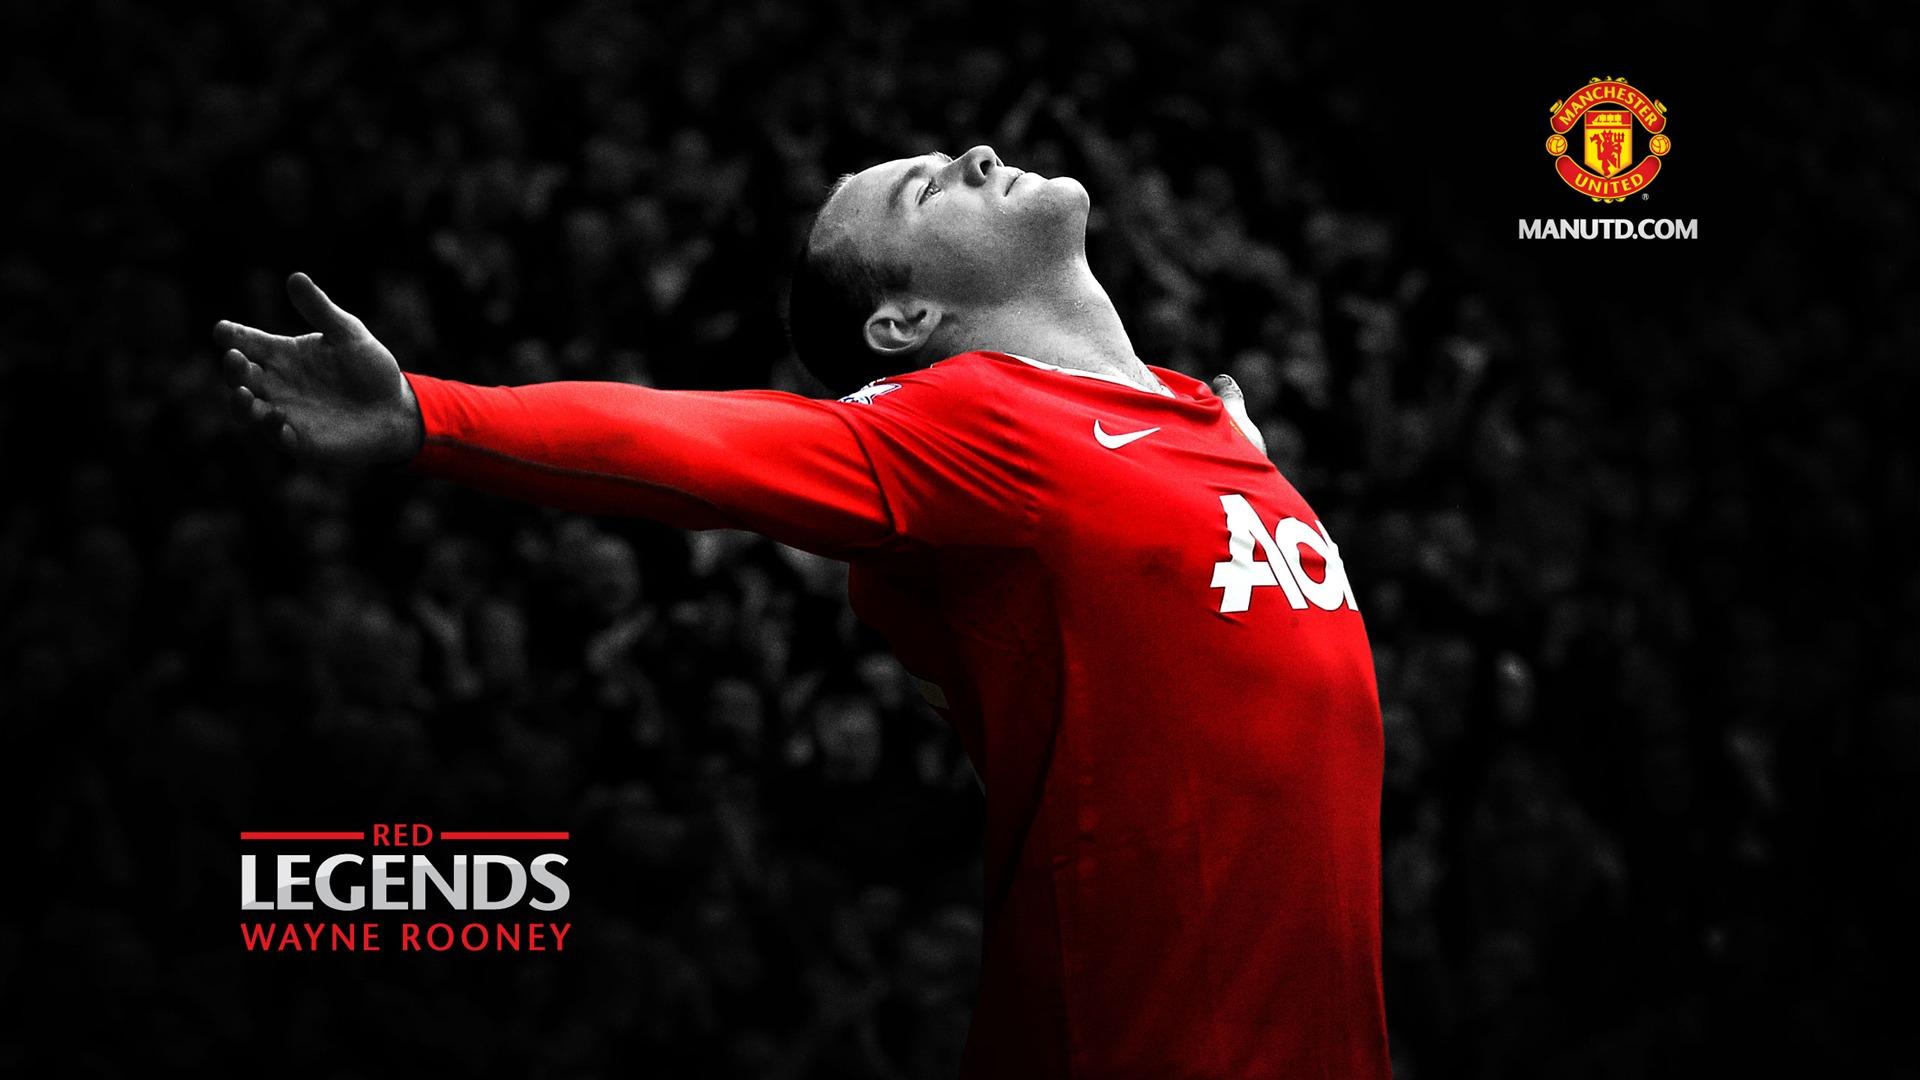 Wayne Rooney - huyền thoại Manchester United